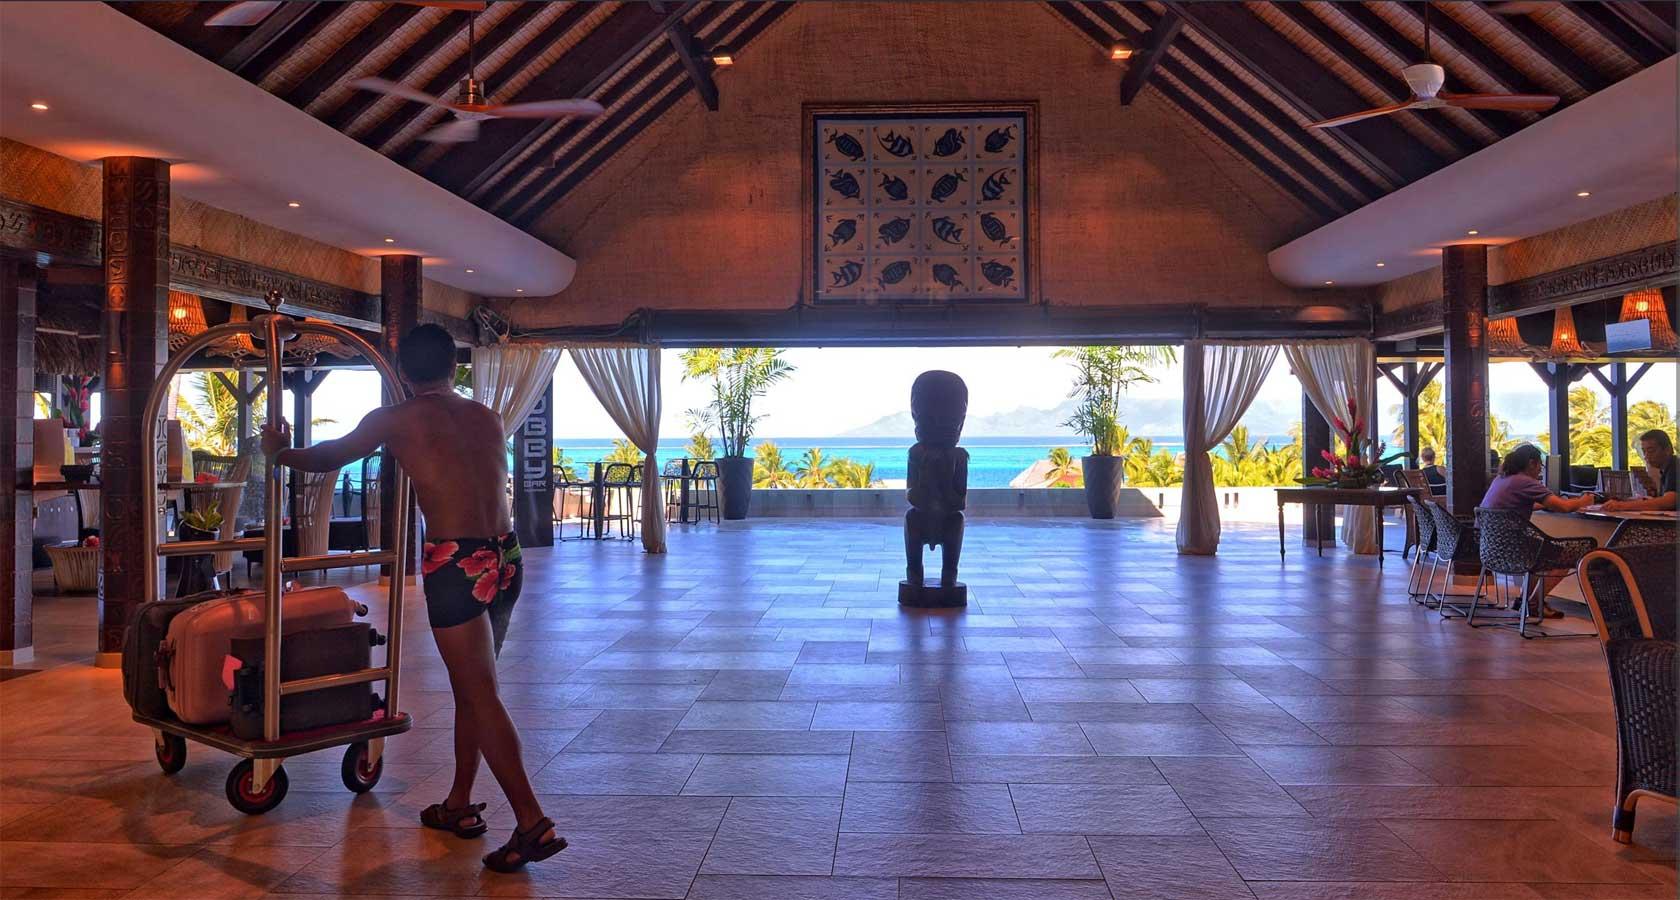 INTERCONTINENTAL RESORT TAHITI lobby area al fresco with ocean views